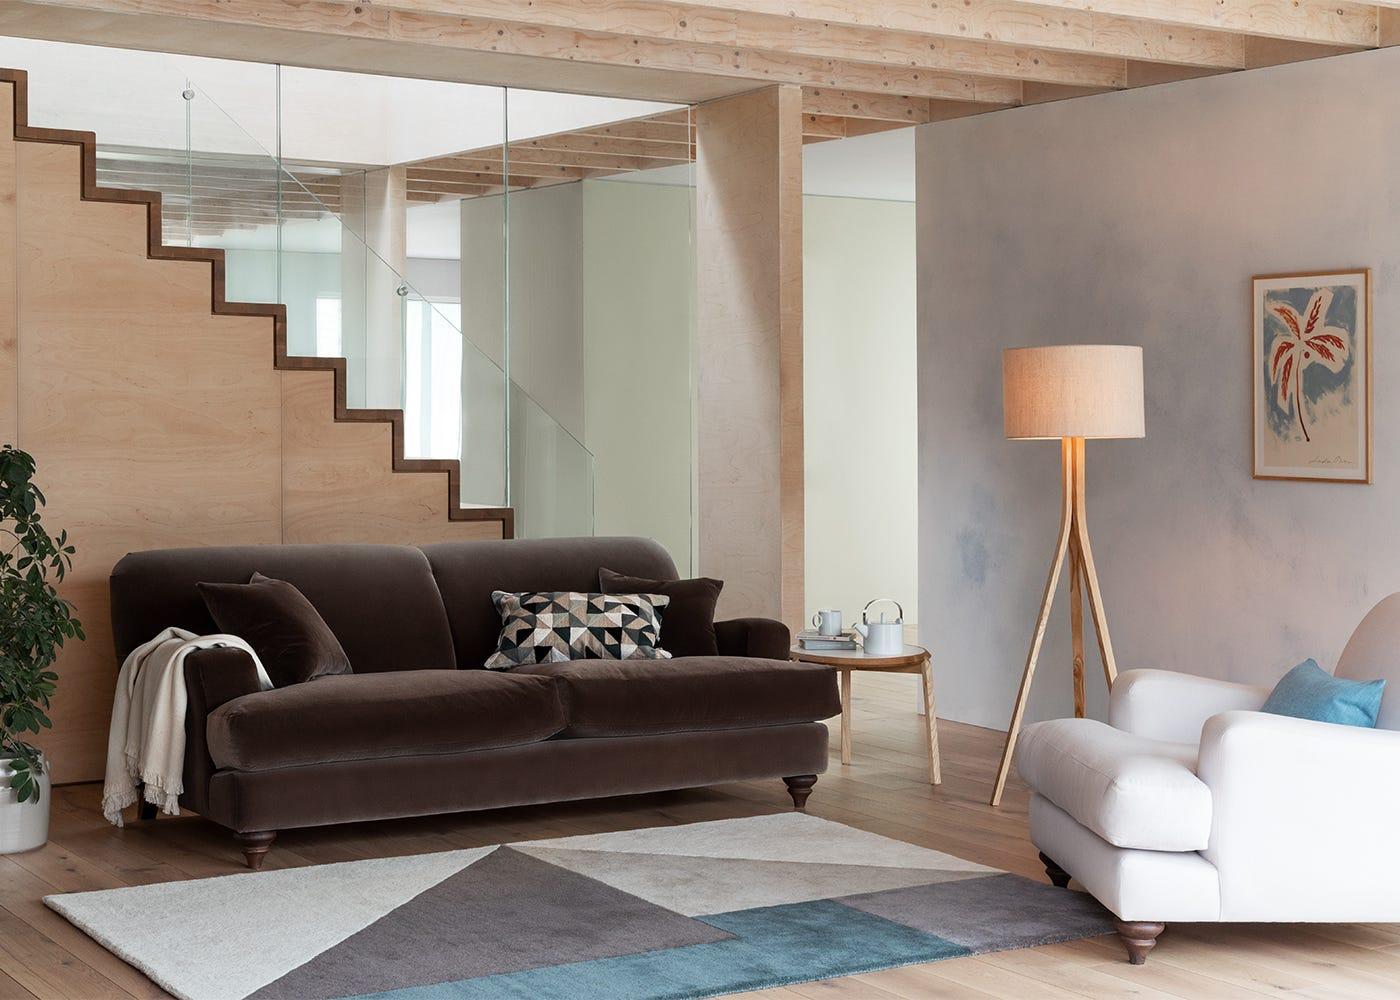 Hampstead 4 Seater Sofa in Velvet Mink with Hampstead Armchair (just seen) in Capelo Linen-Cotton Snowdrop